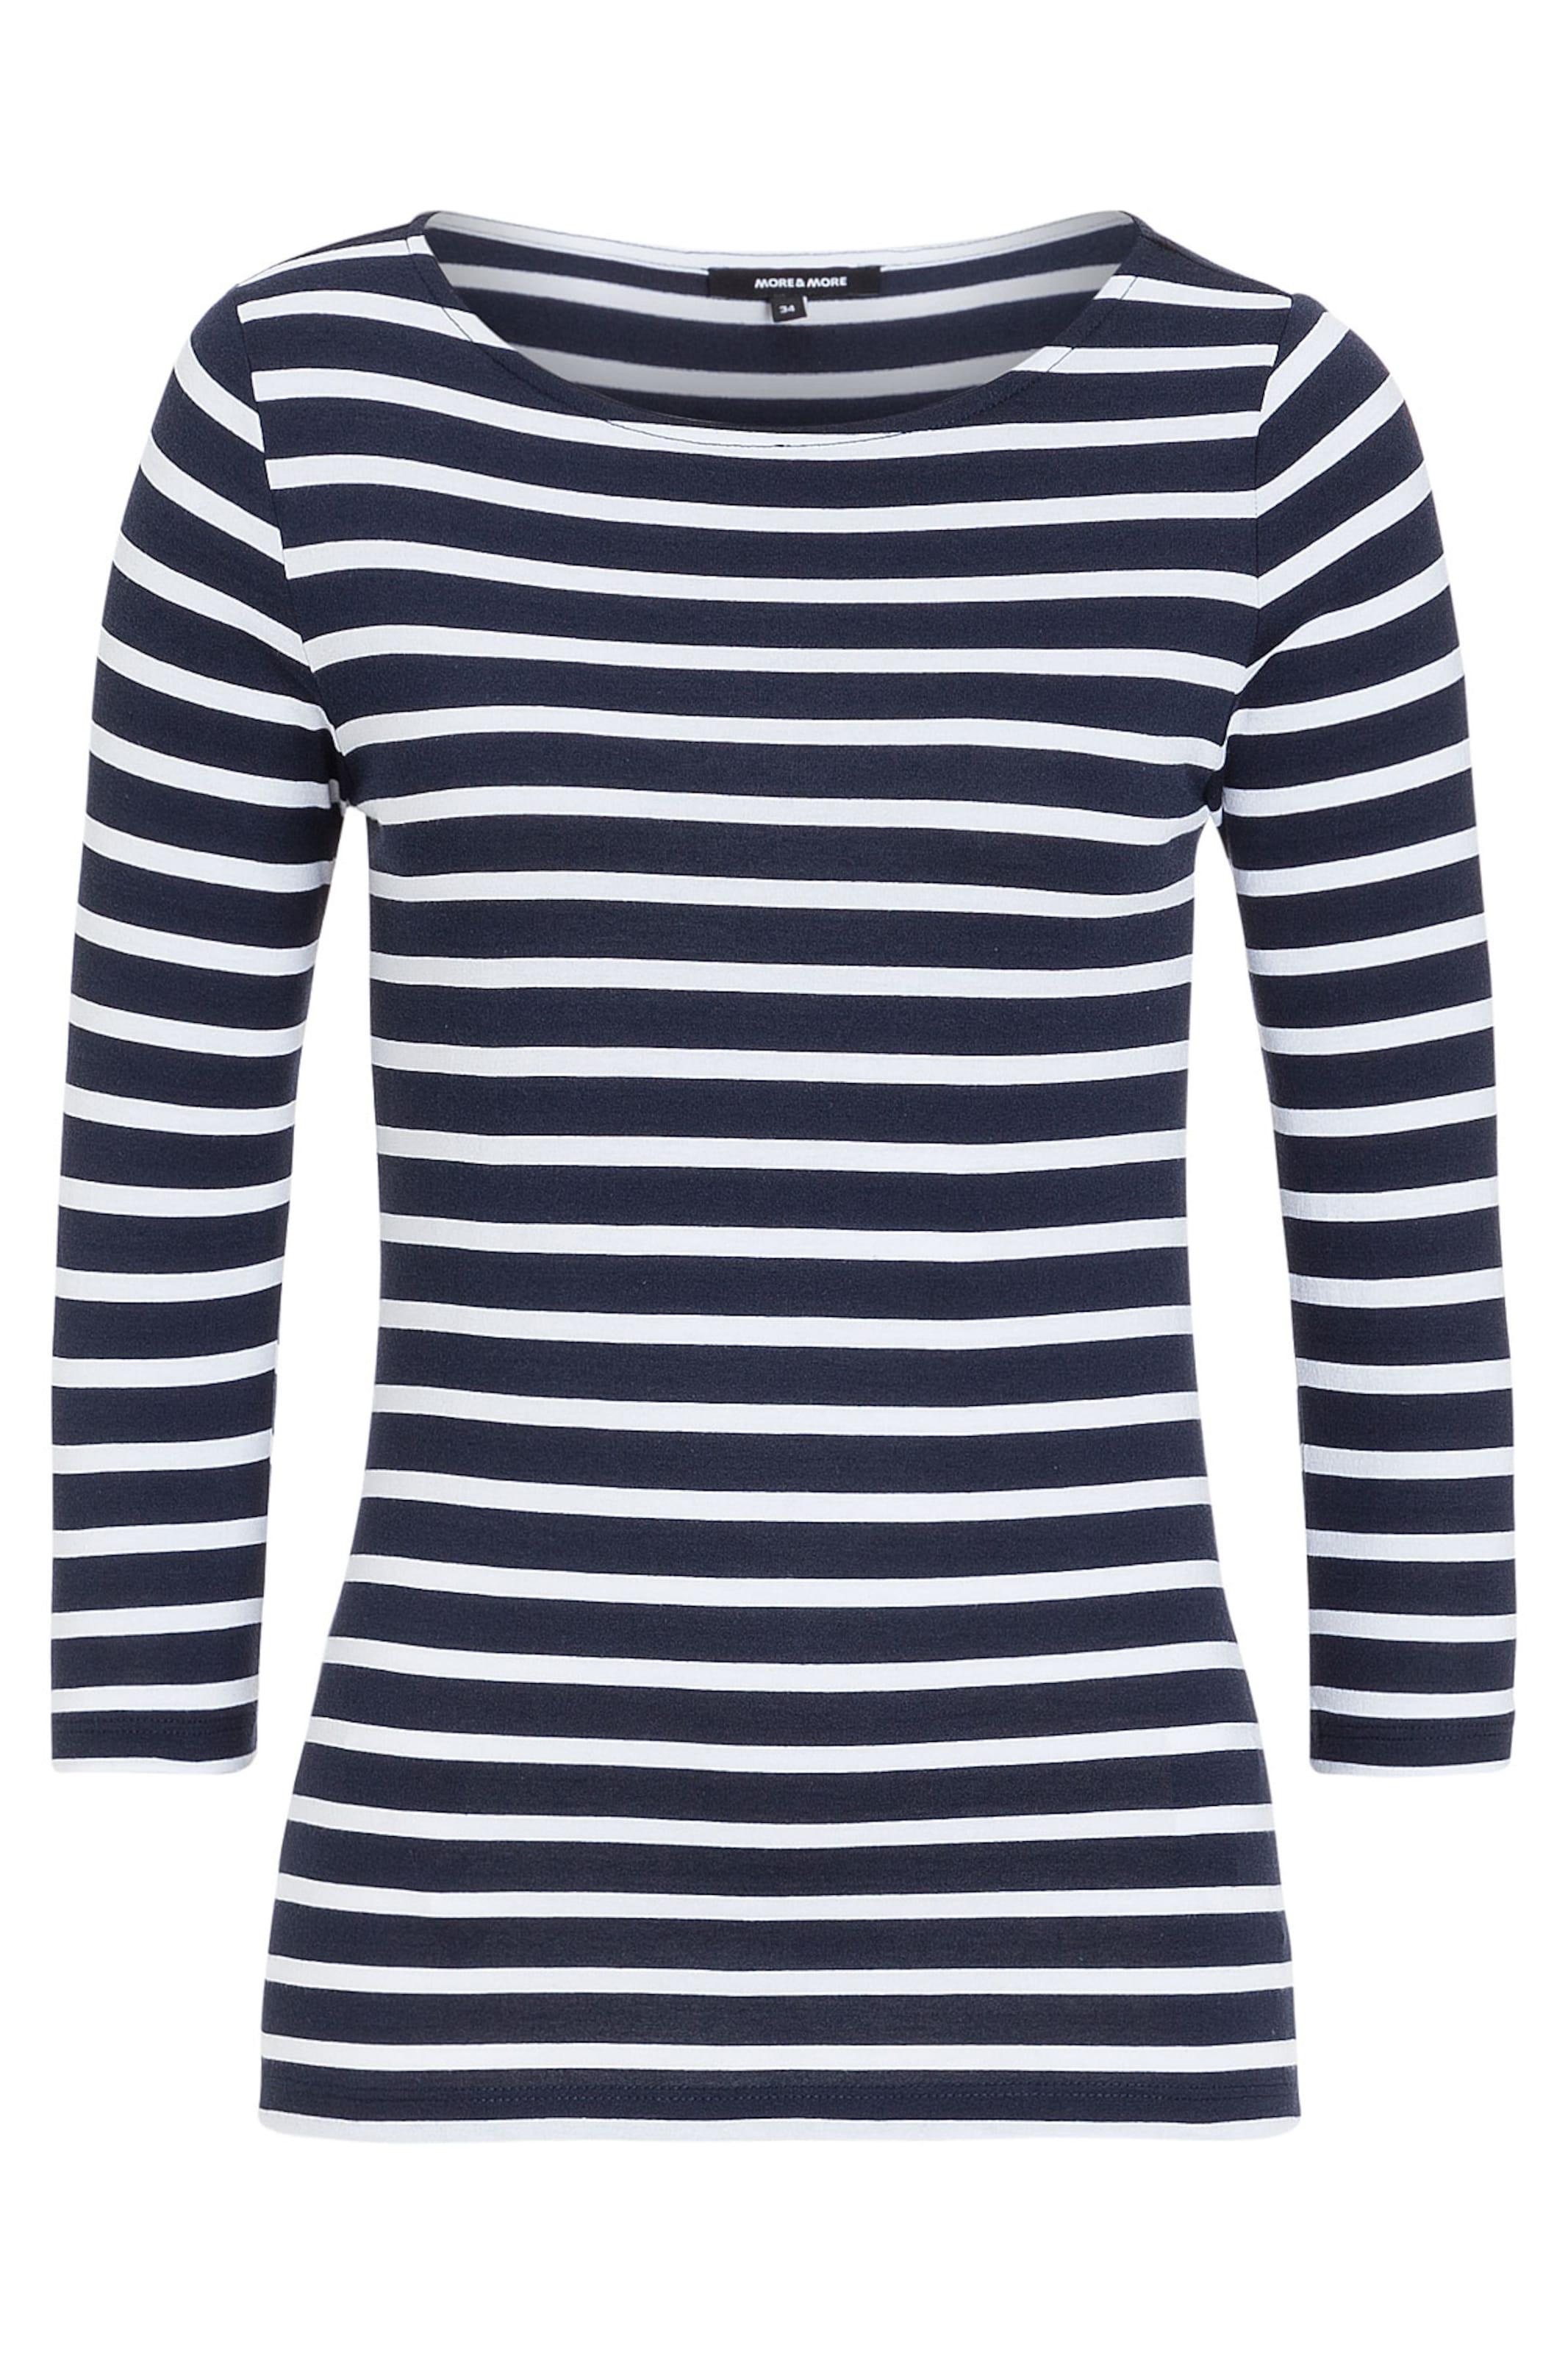 Freies Verschiffen Beruf Freies Verschiffen Fälschung MORE & MORE Shirt Günstig Kaufen Best Pick Billig Footlocker Finish OC7X2